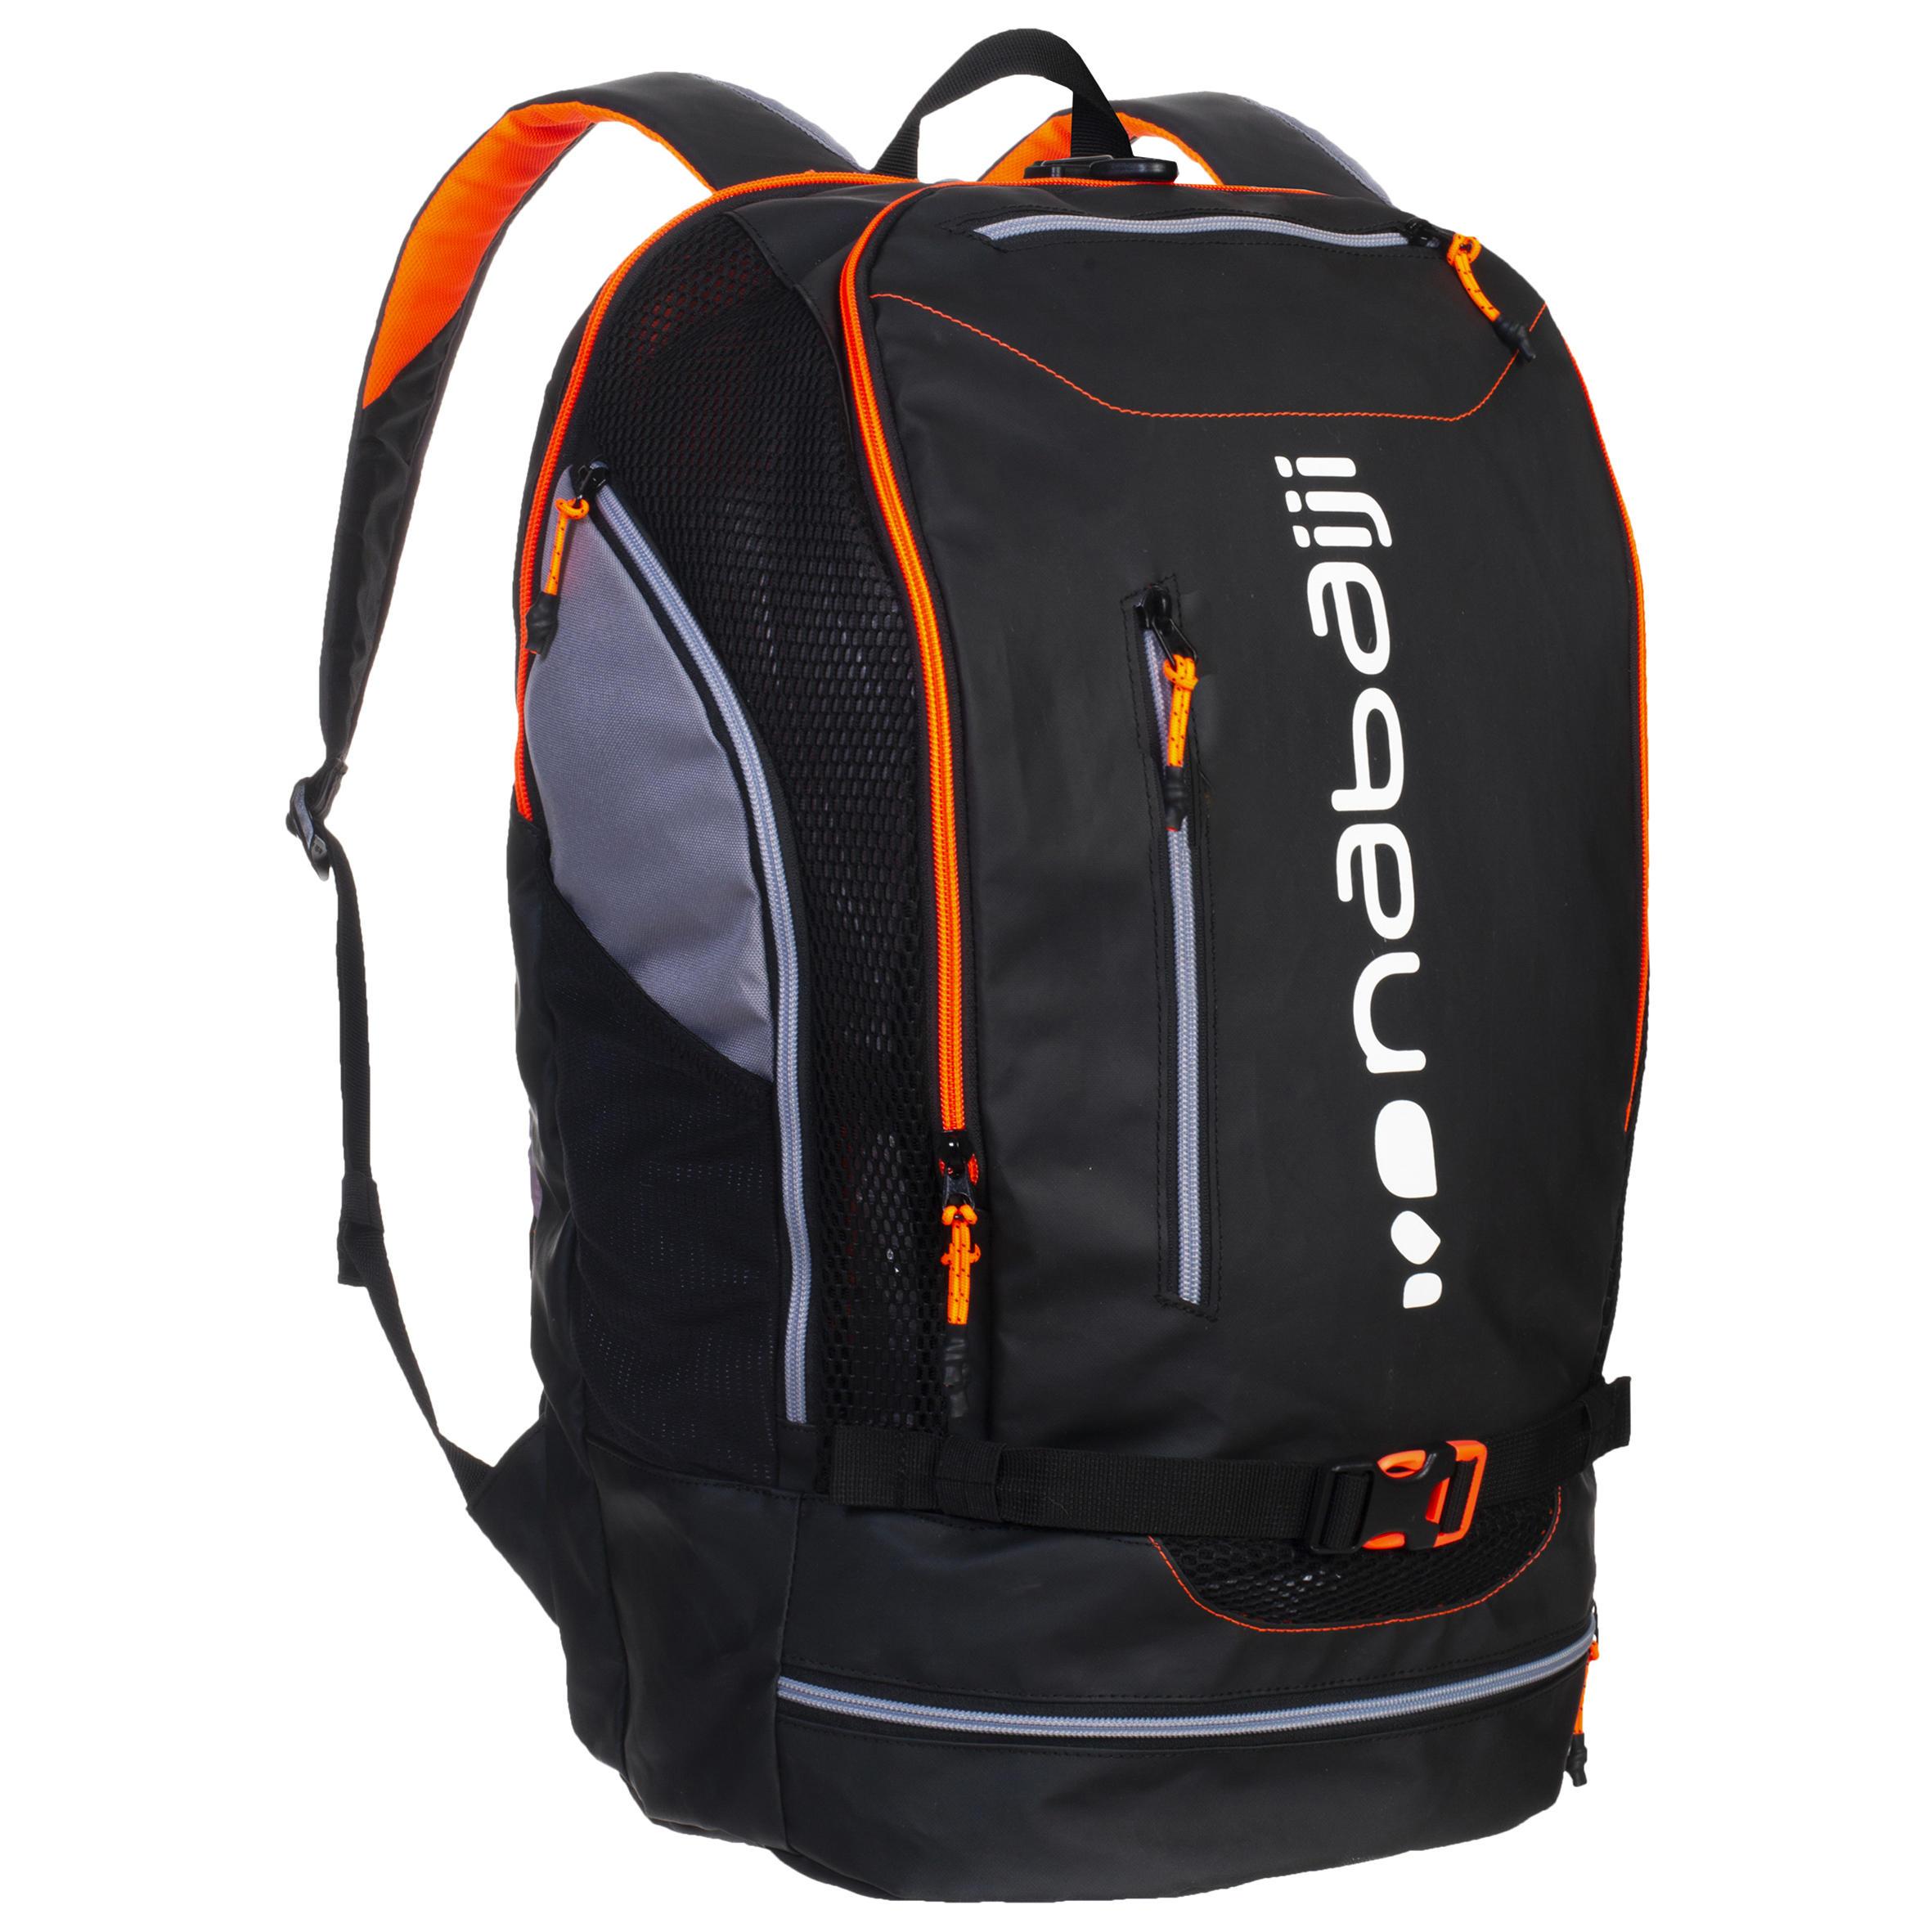 40-Litre Swim Backpack - Black Red